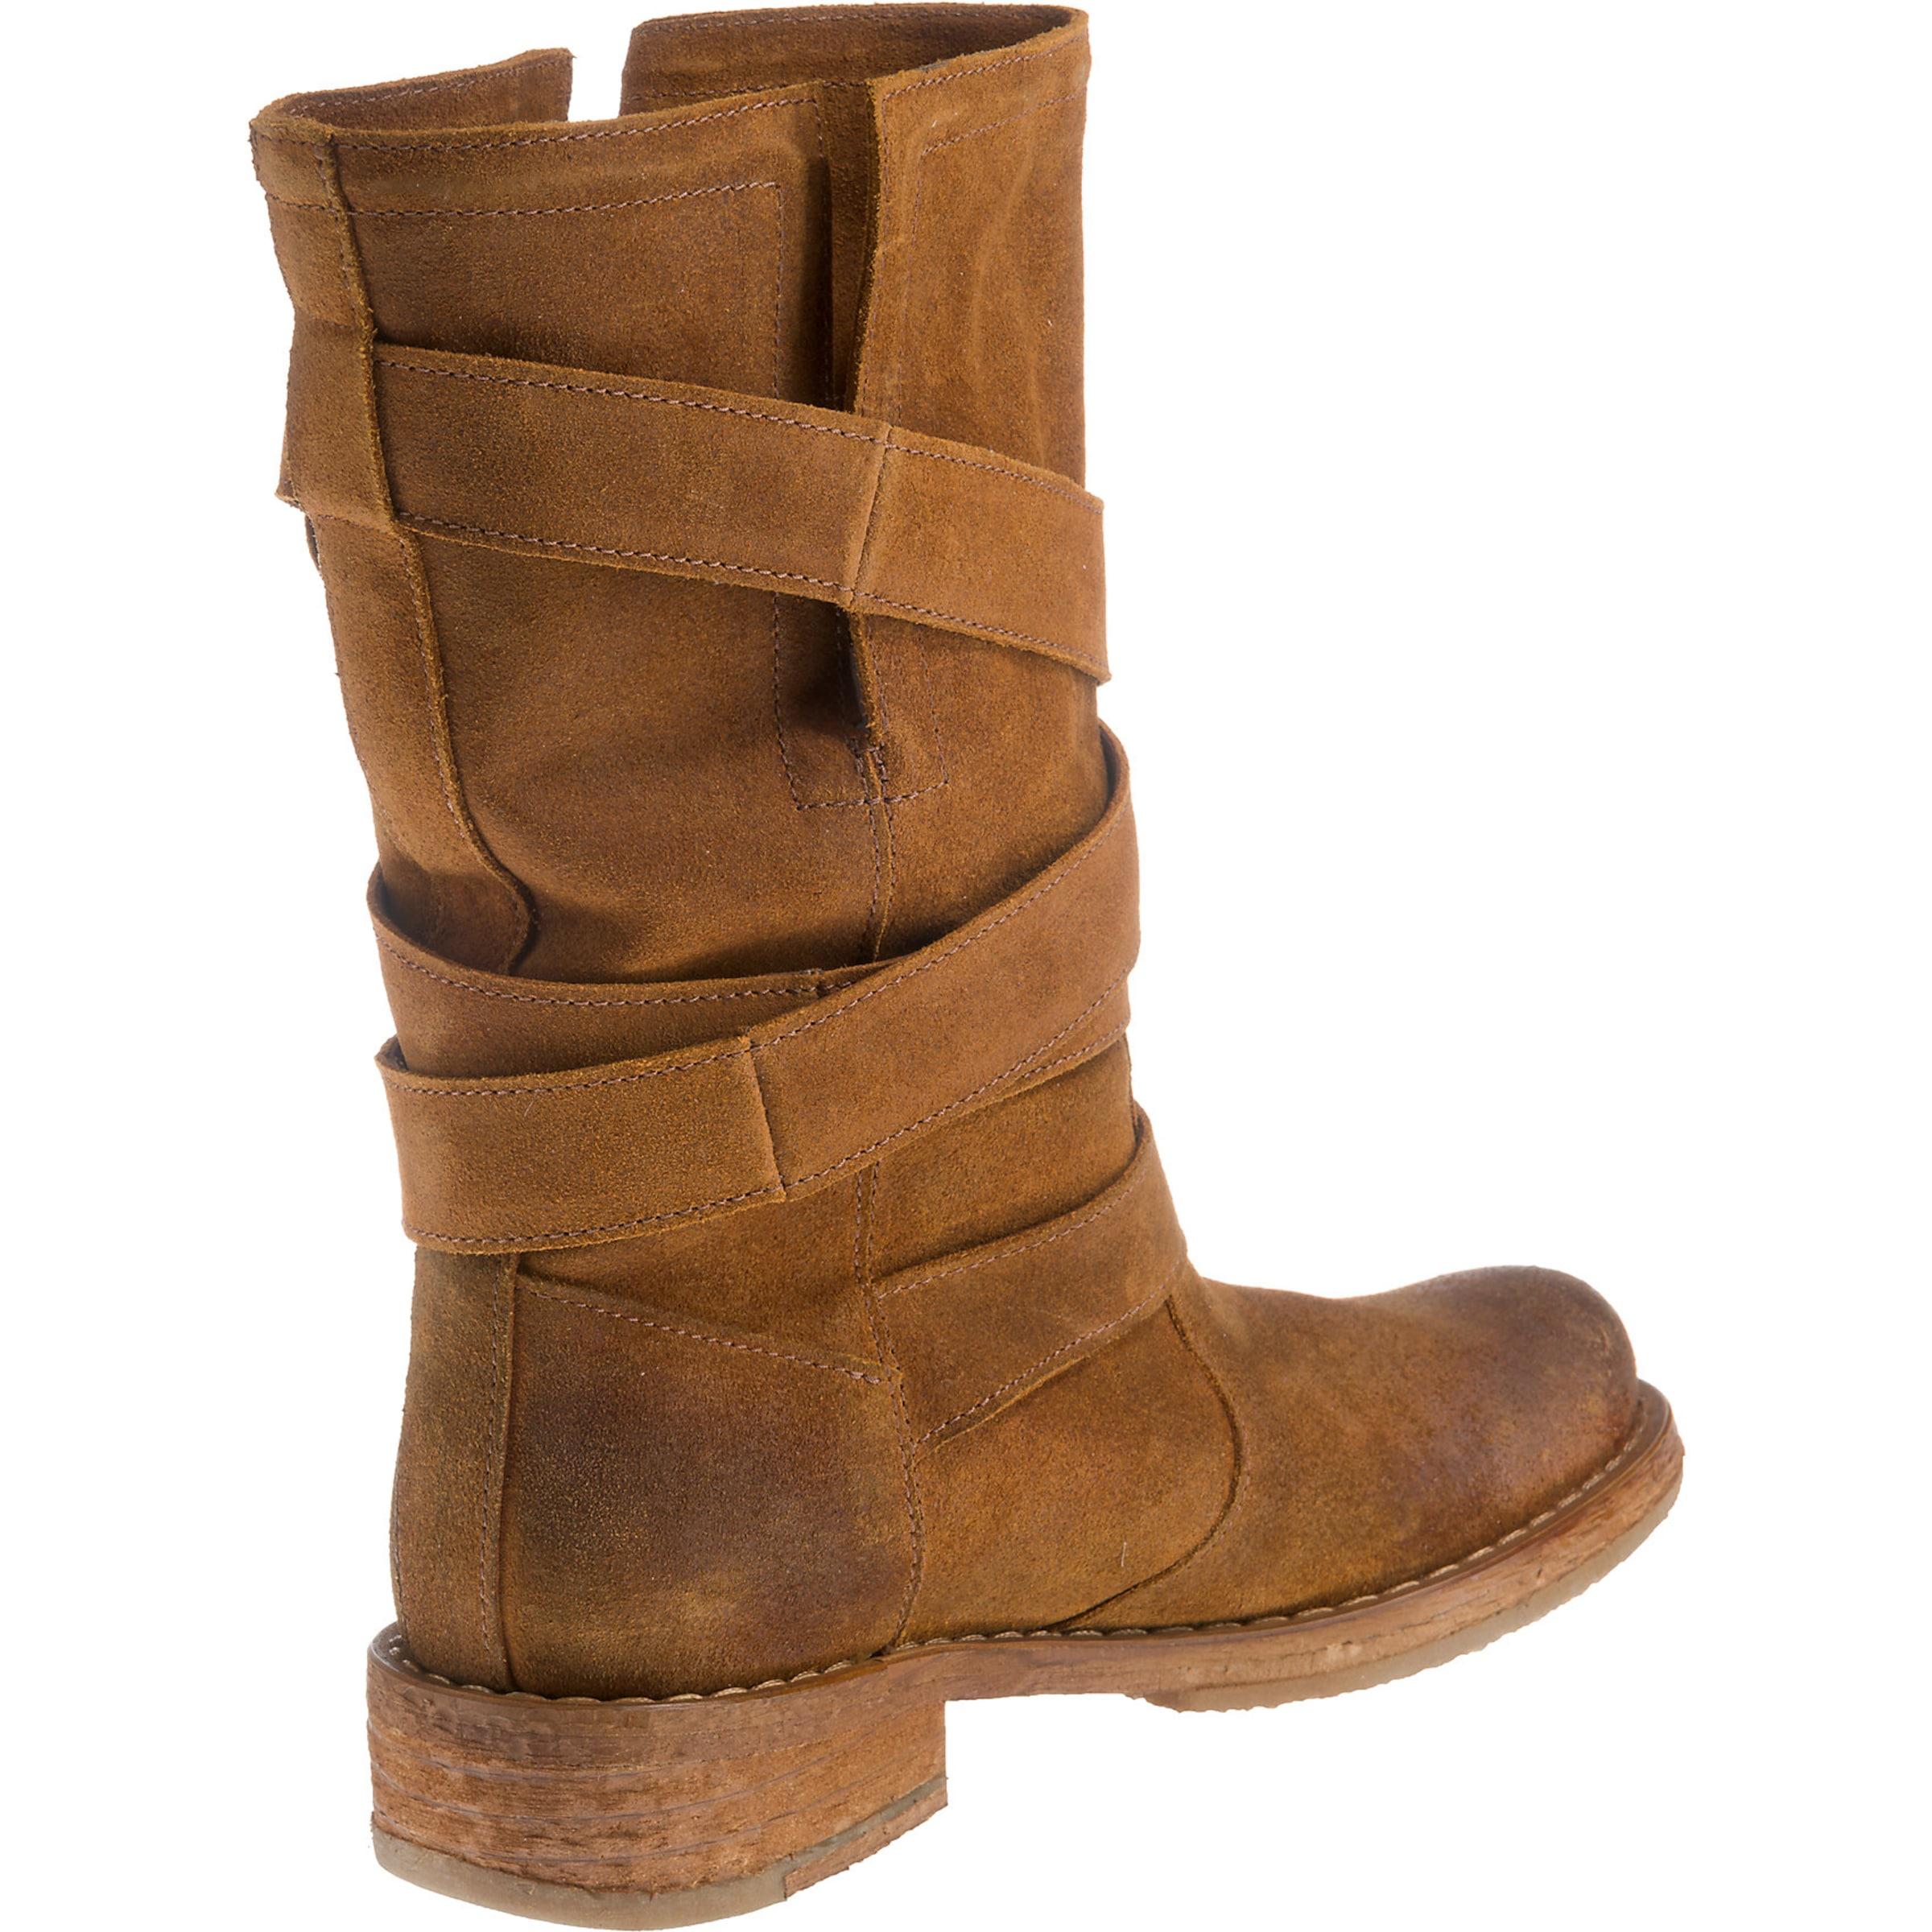 FELMINI Stiefel Stiefel Stiefel 'Cooper Leder Bequem, gut aussehend 09f946